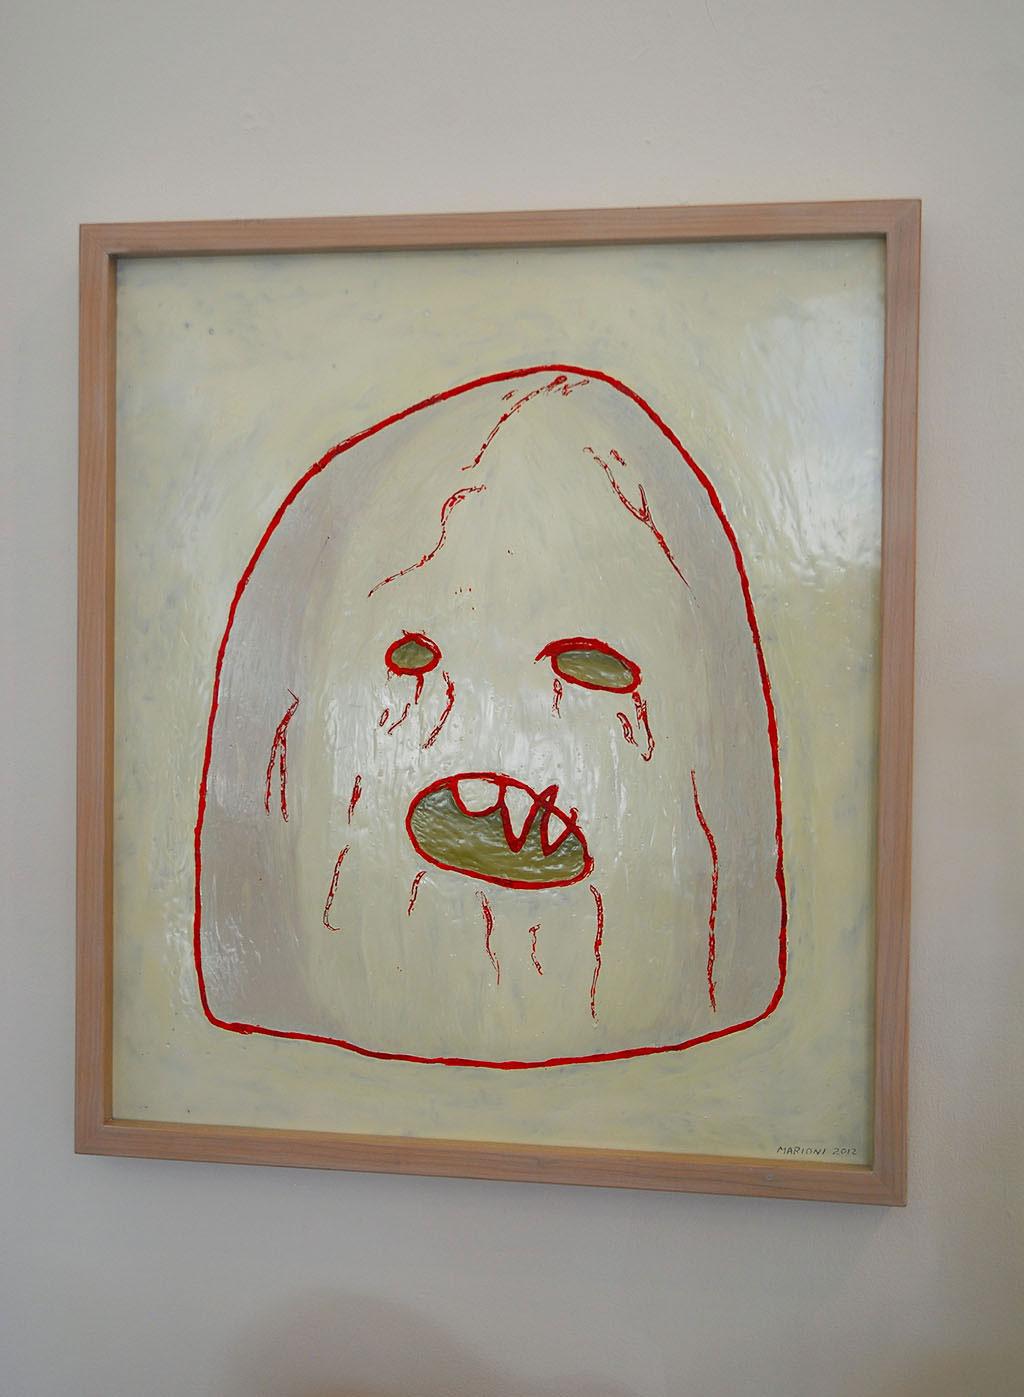 Paul Marioni, Mean Mountain, 2012